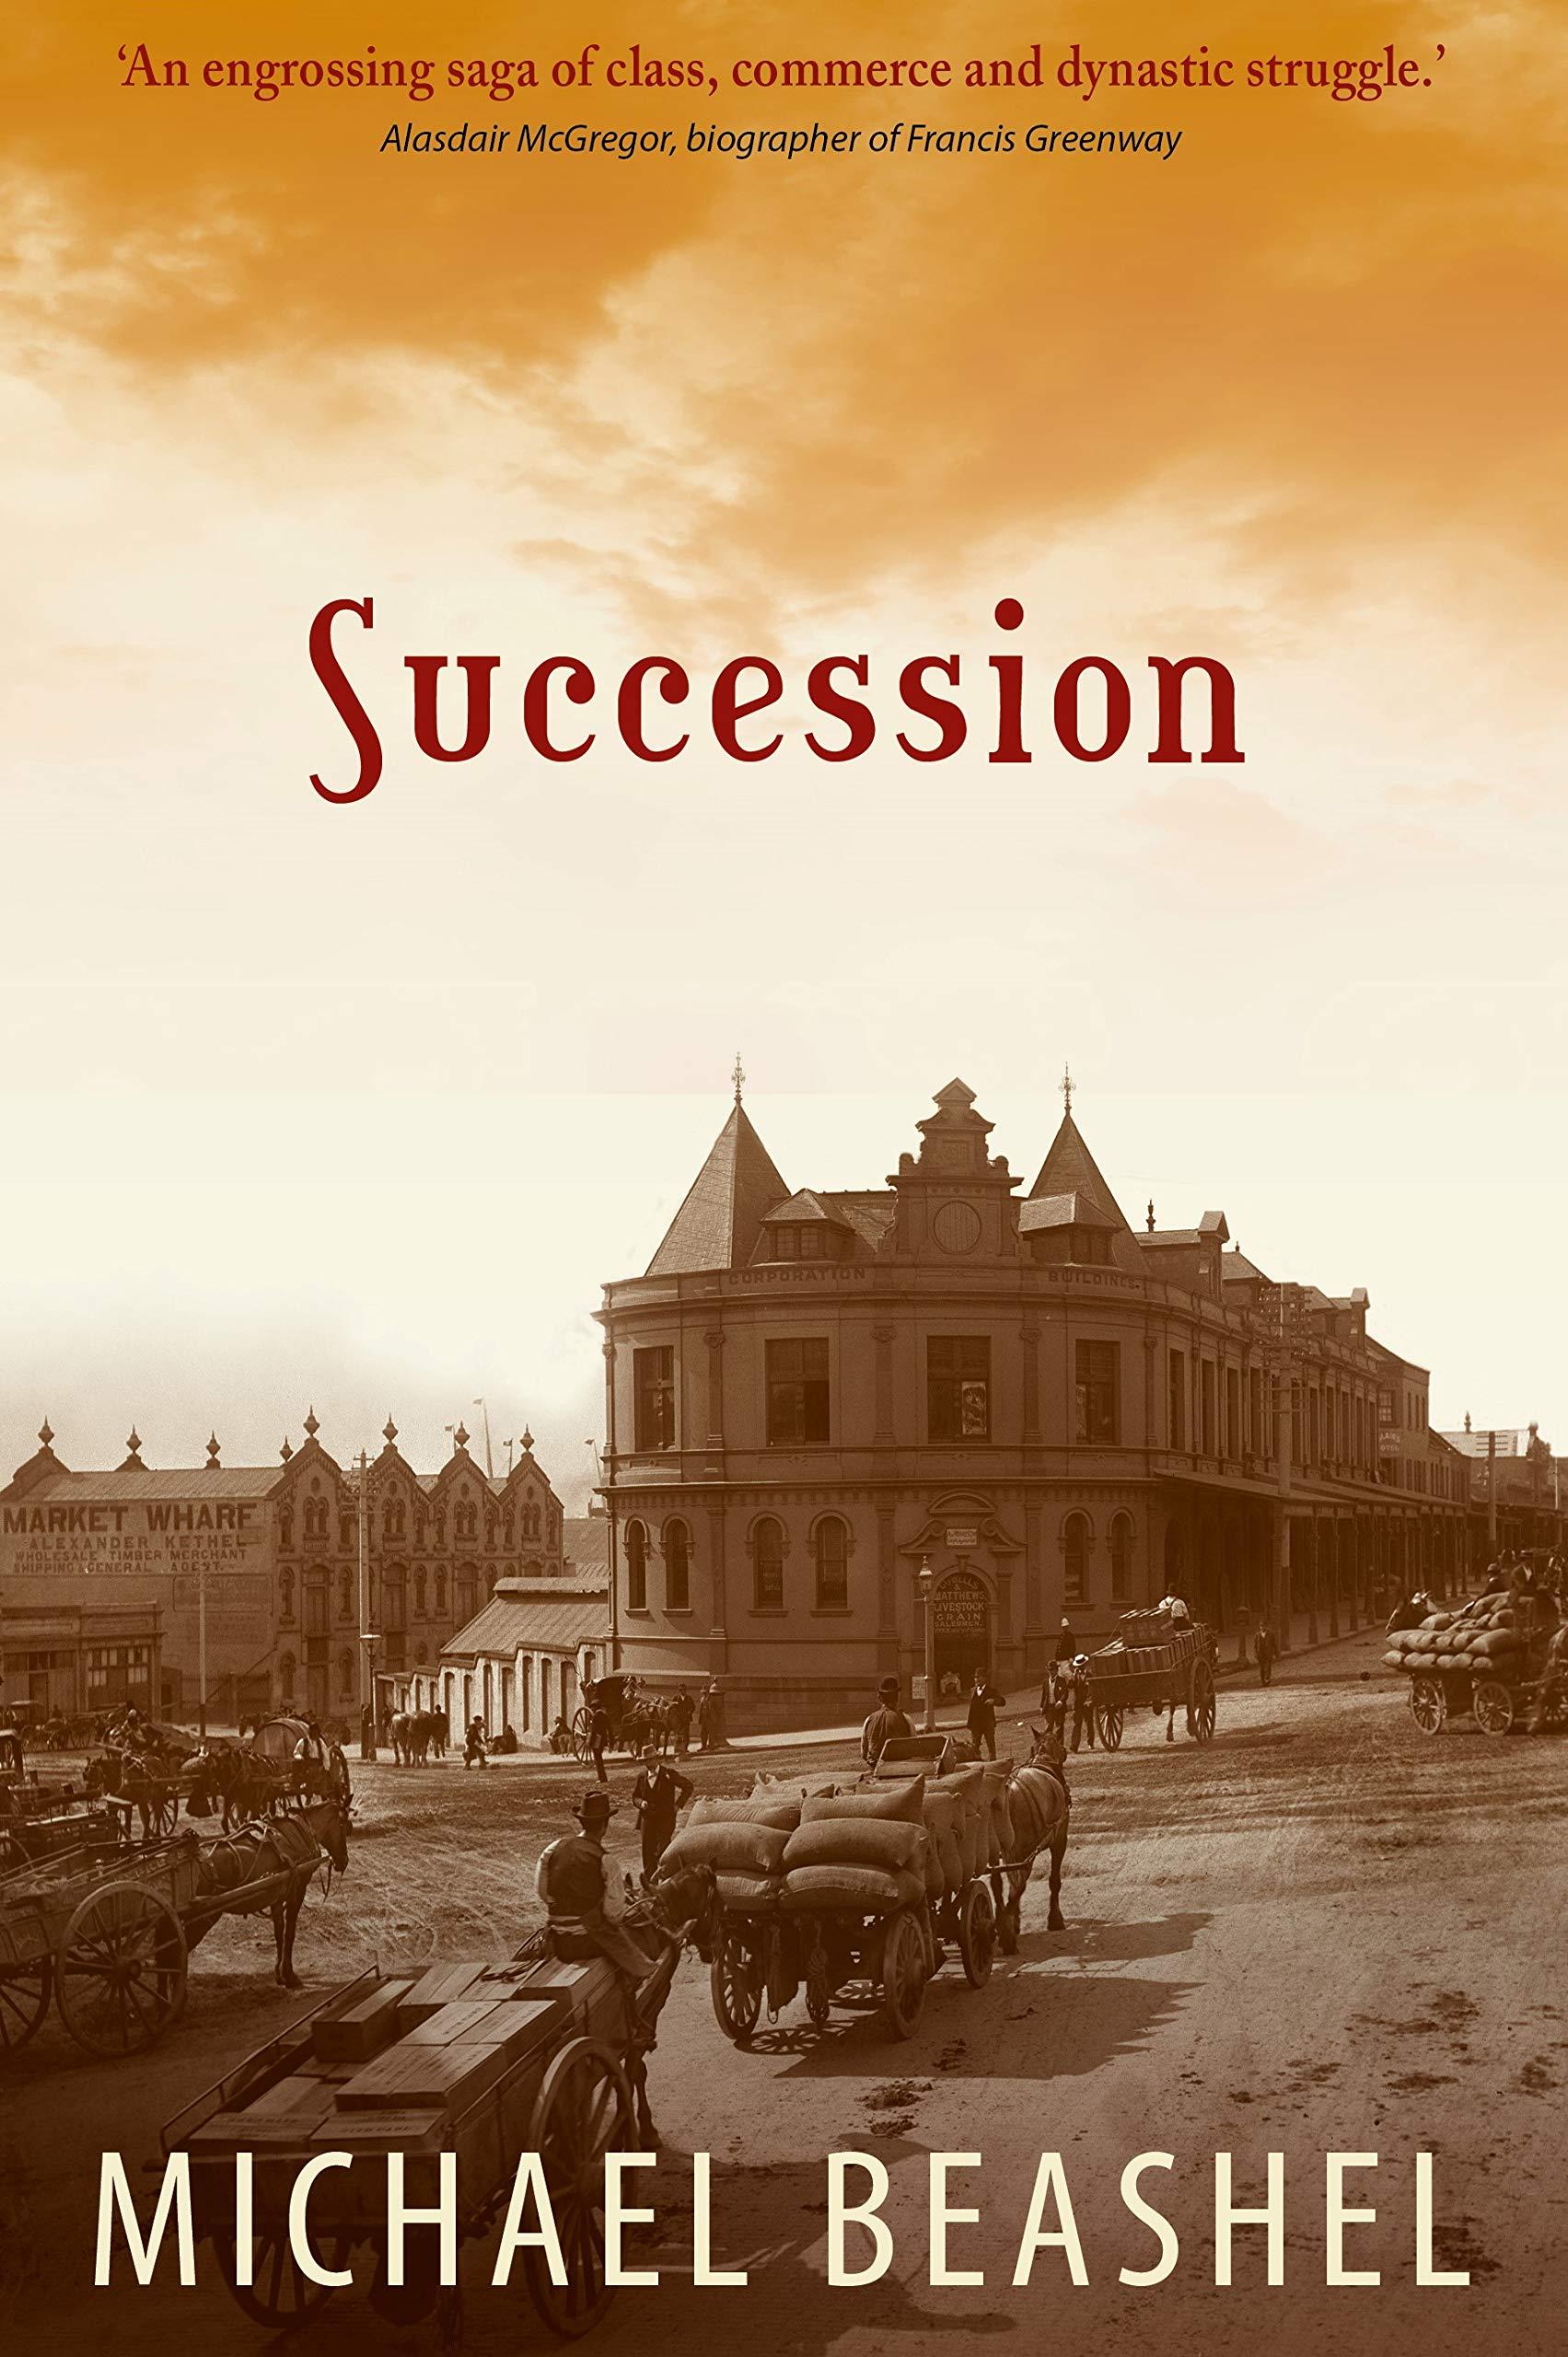 Succession: Australian Historical Fiction Novel (The Sandstone Trilogy Book 3)